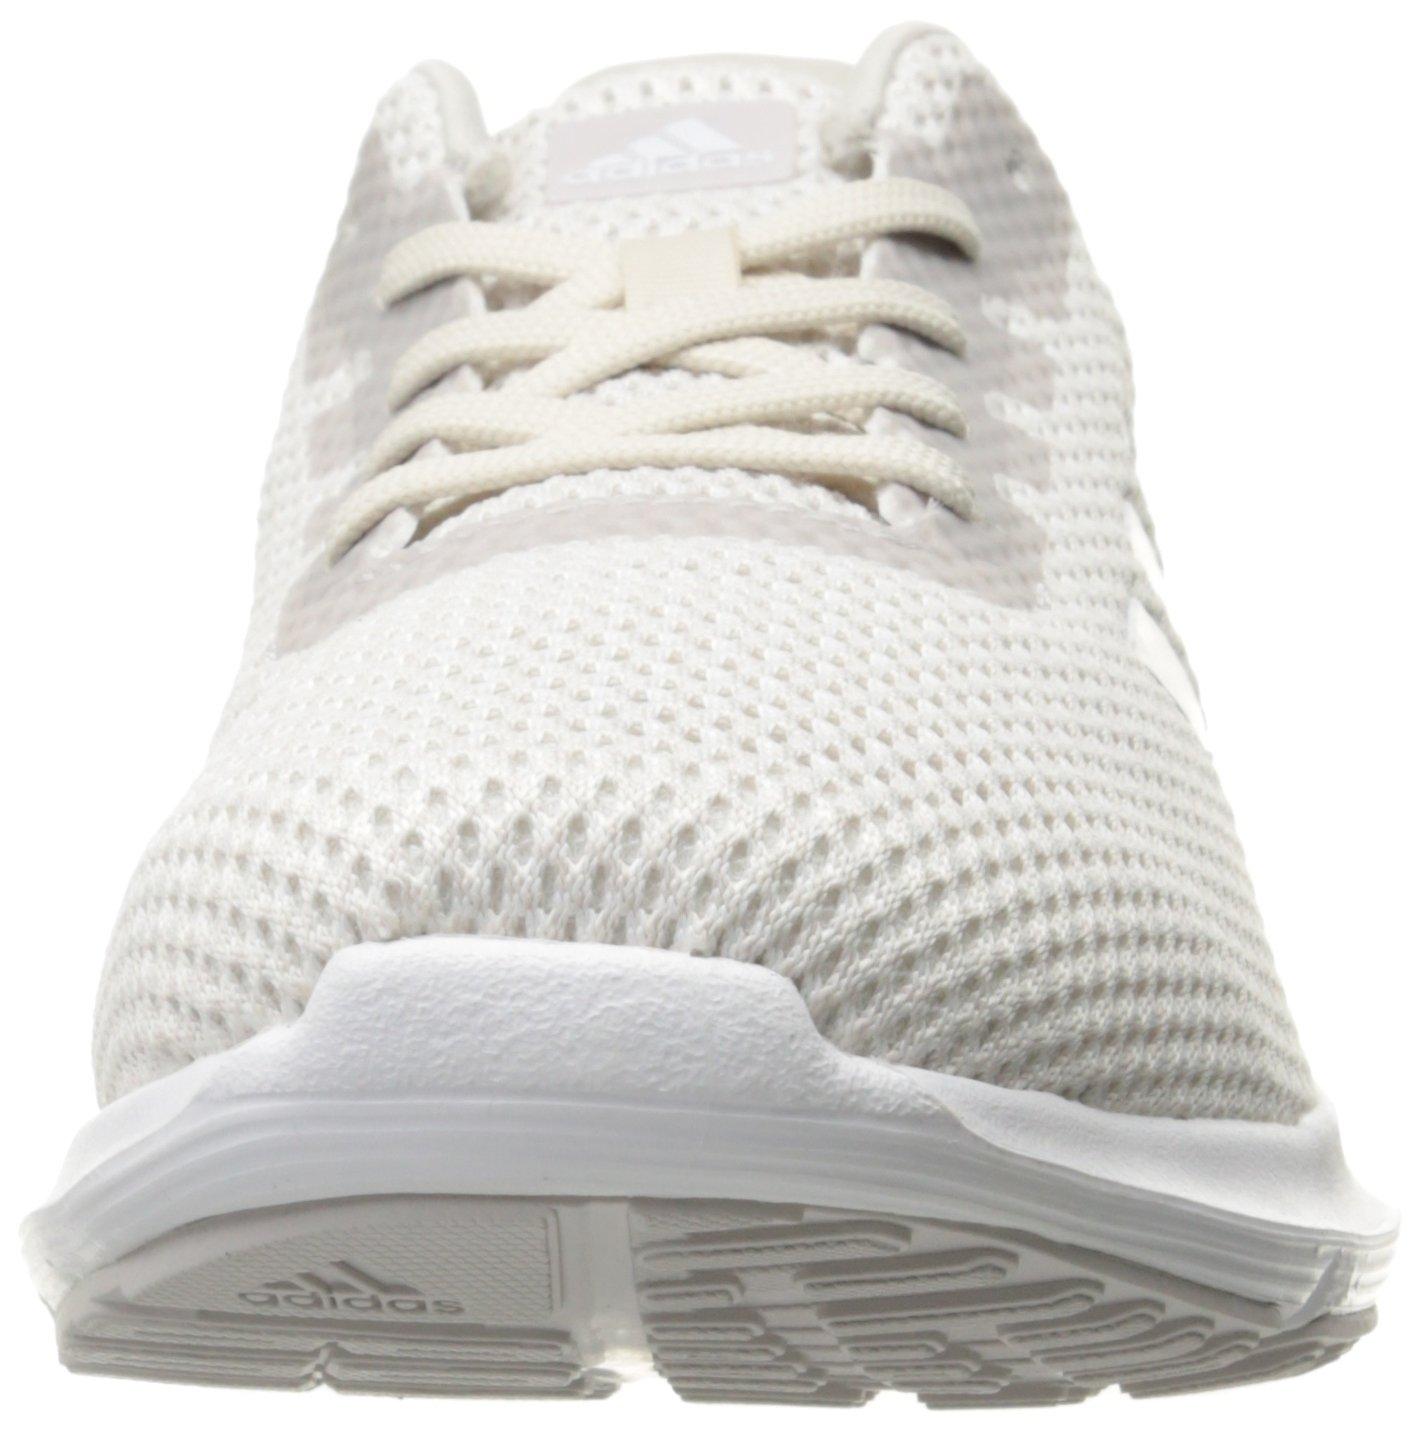 adidas Women's Cosmic 2 Sl 7.5 W Running Shoe B01N1TDQ24 7.5 Sl B(M) US|White/Black/White 11e295